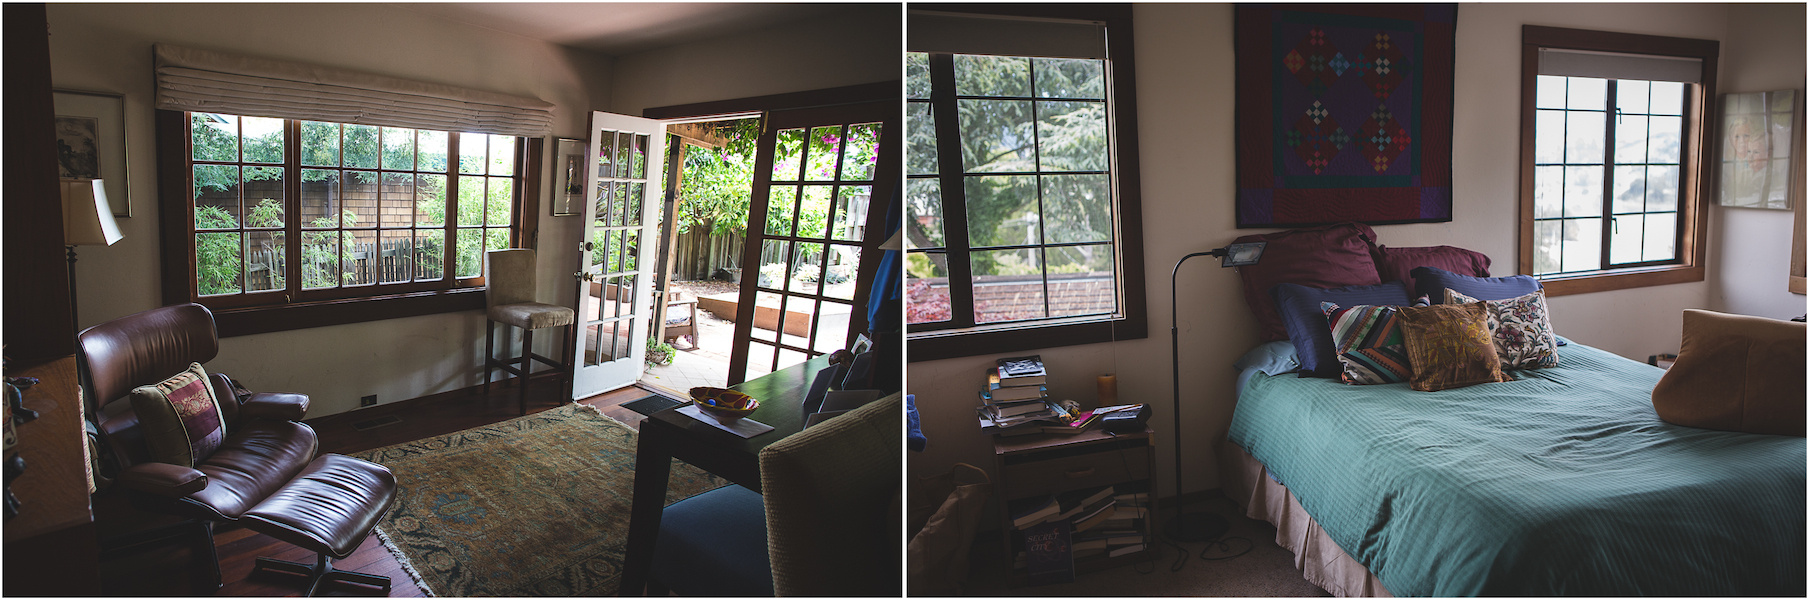 RoomsD.jpg